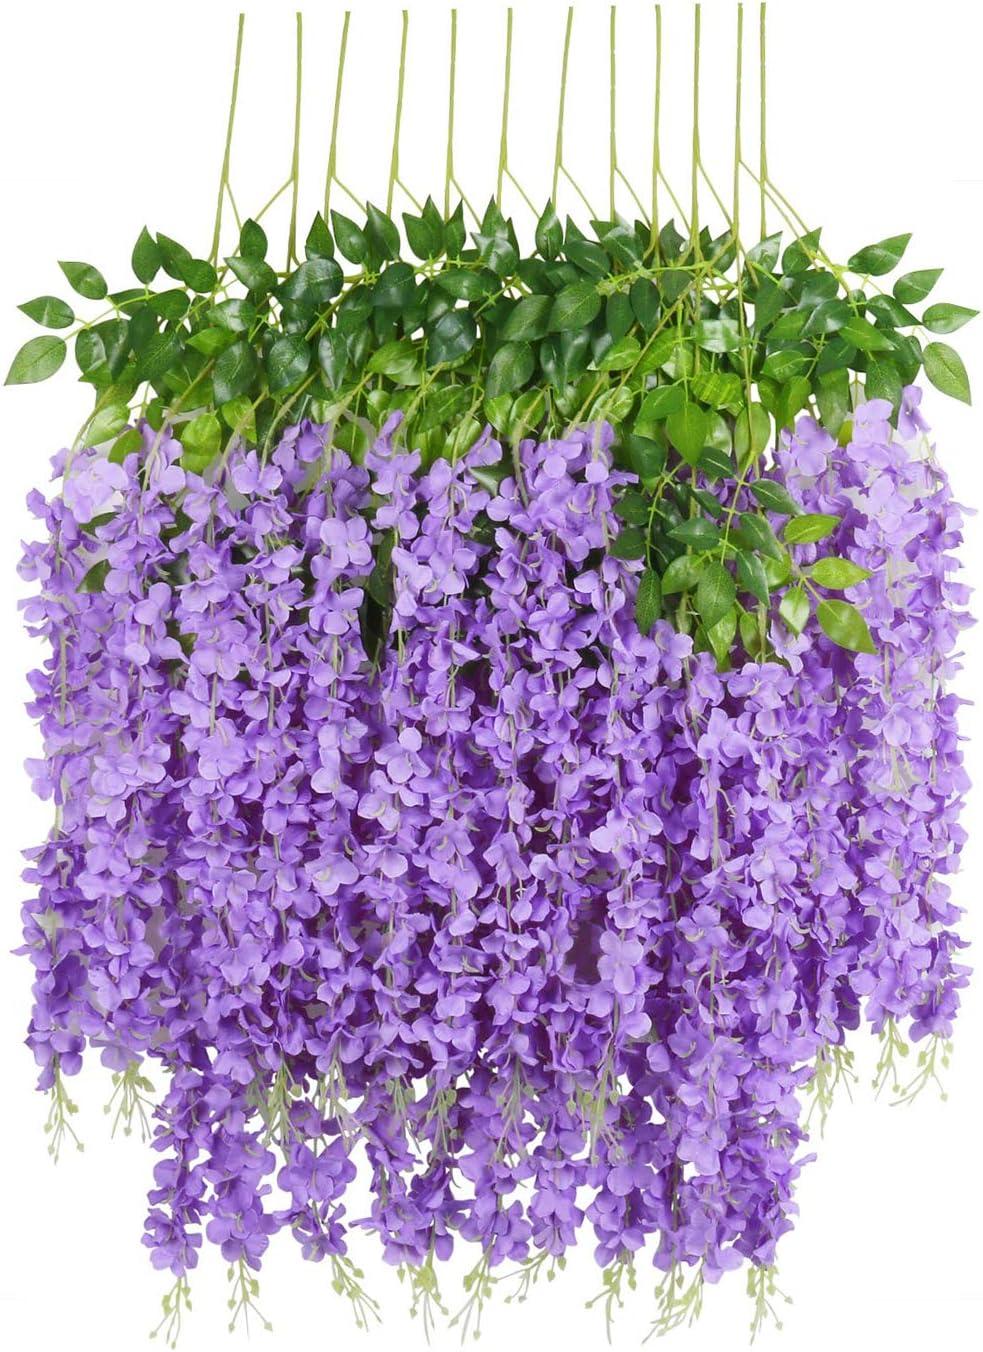 U'Artlines 12 Pack 3.6 Feet Artificial Fake Wisteria Vine Ratta Hanging Garland Silk Flowers String Home Party Wedding Decor (12, Purple)